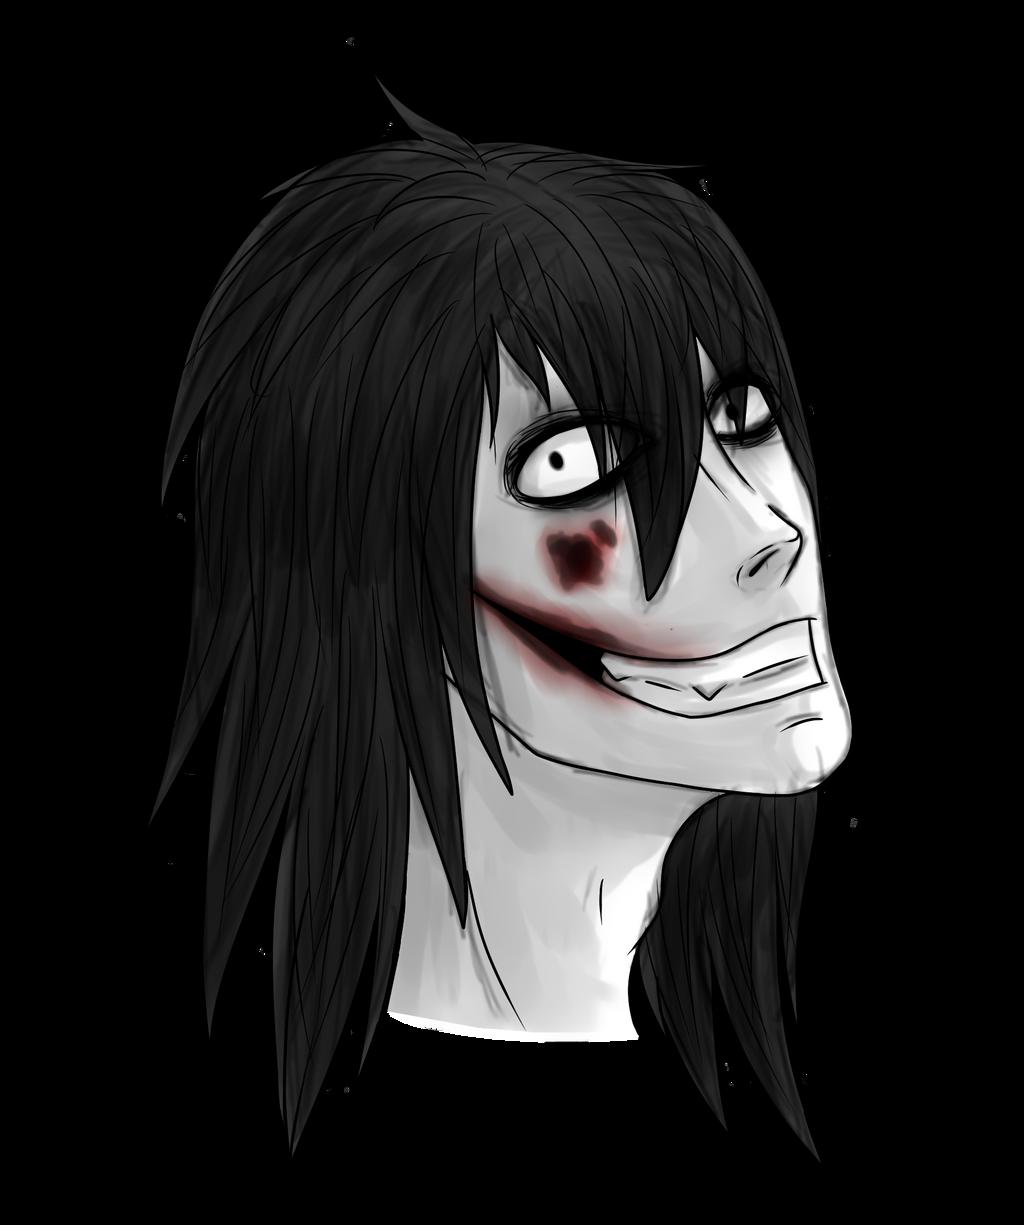 Jeff the killer by Satoga